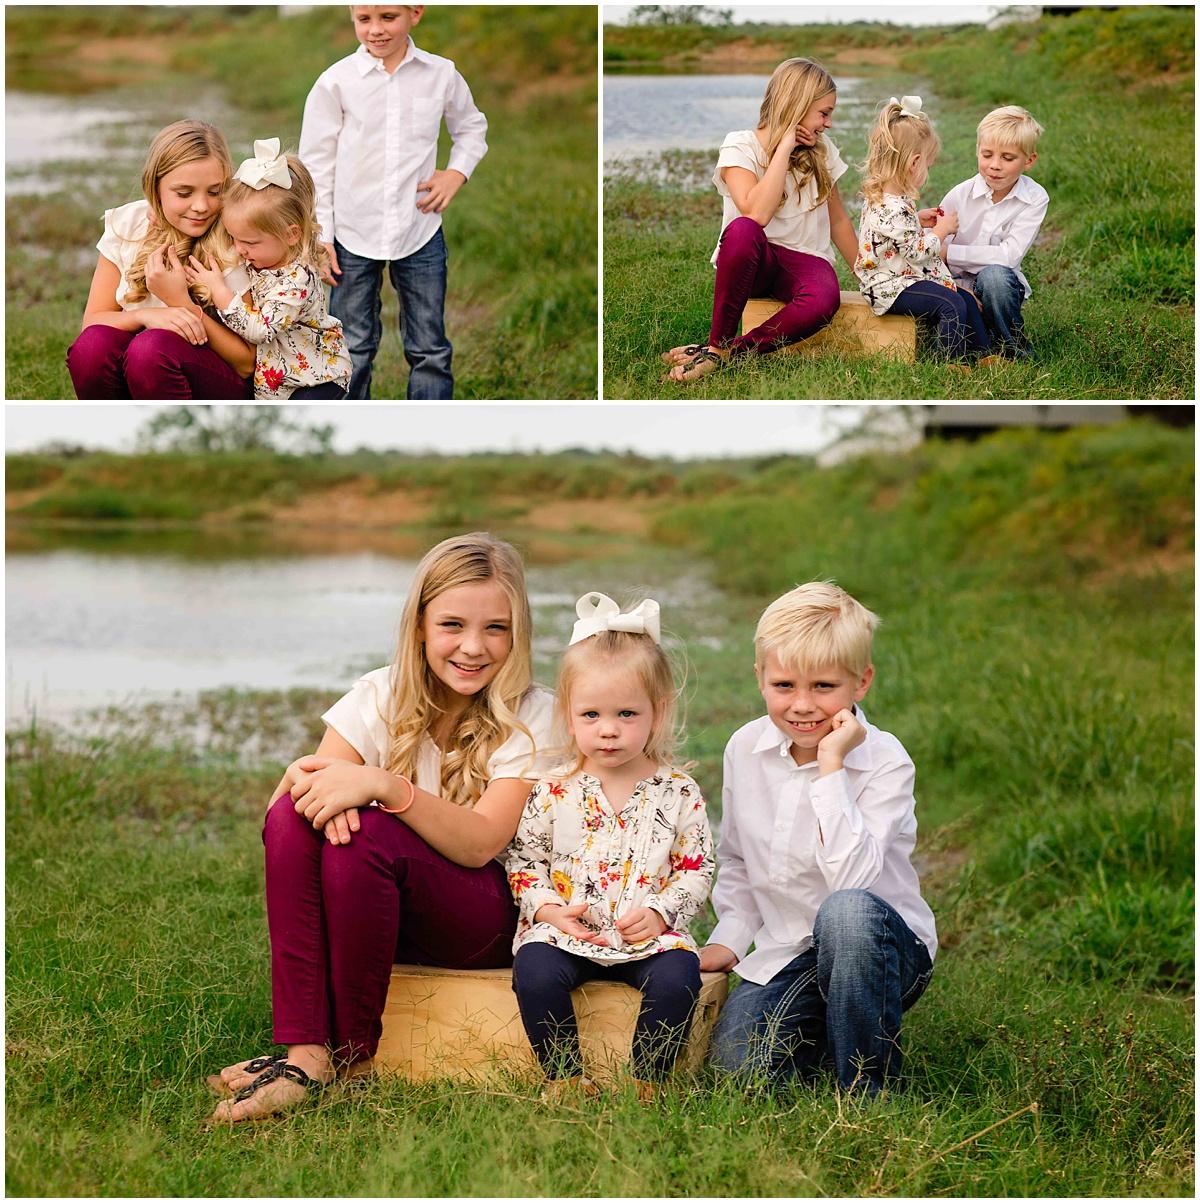 Family-Children-Maternity-Portraits-San-Antonio-Hill-Country-Texas-Carly-Barton-Photography_0028.jpg